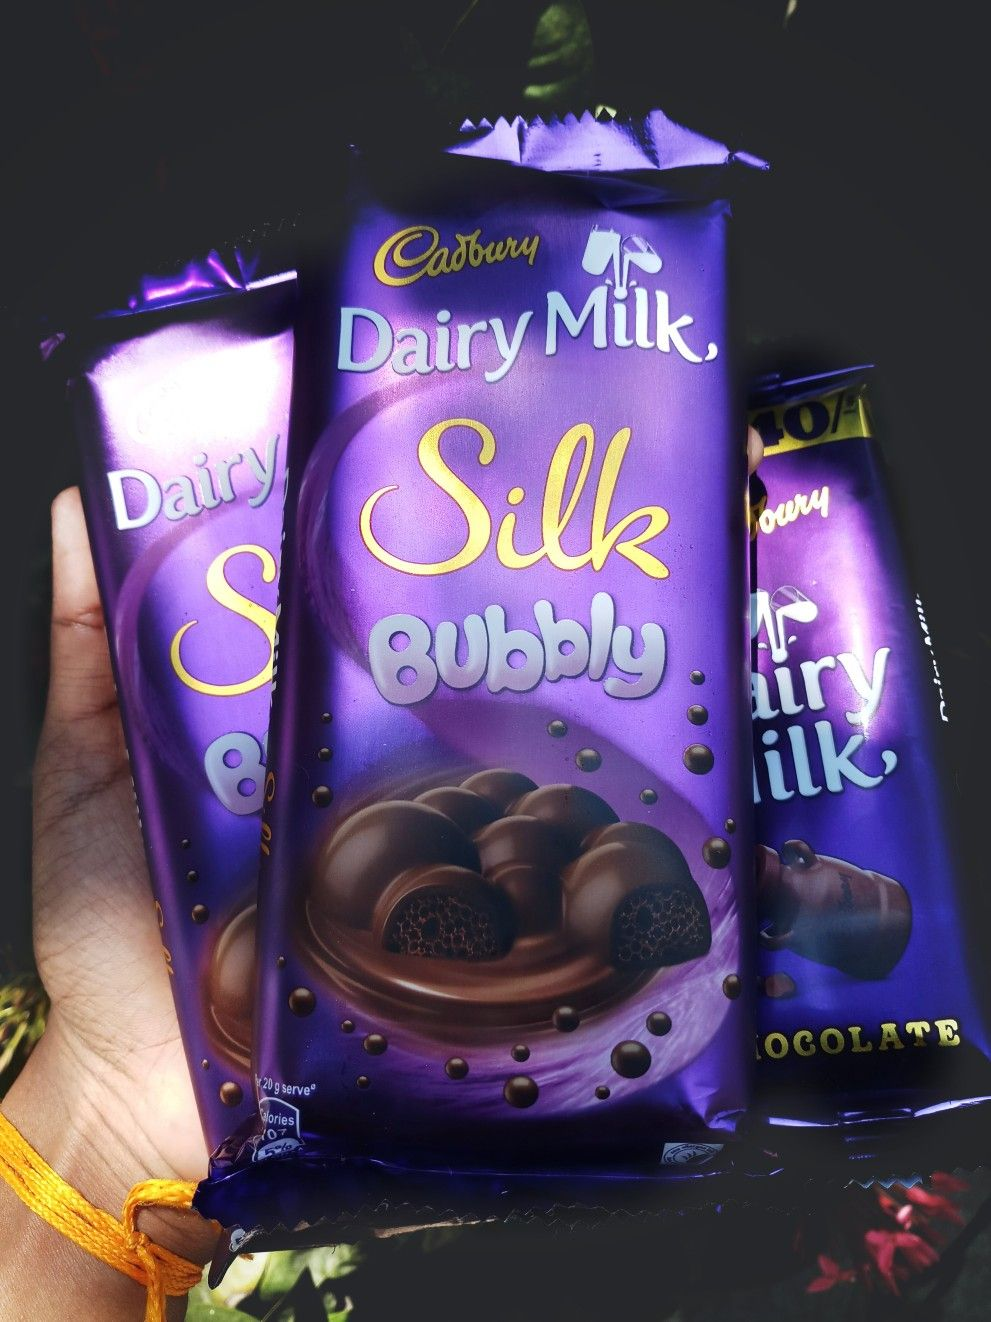 Chocolate Dairymilk Chocolatelover Sweet Food Foodie Dairy Milk Chocolate Dairy Milk Chocolate Cadbury Photography Dairy Milk Chocolate Cadbury